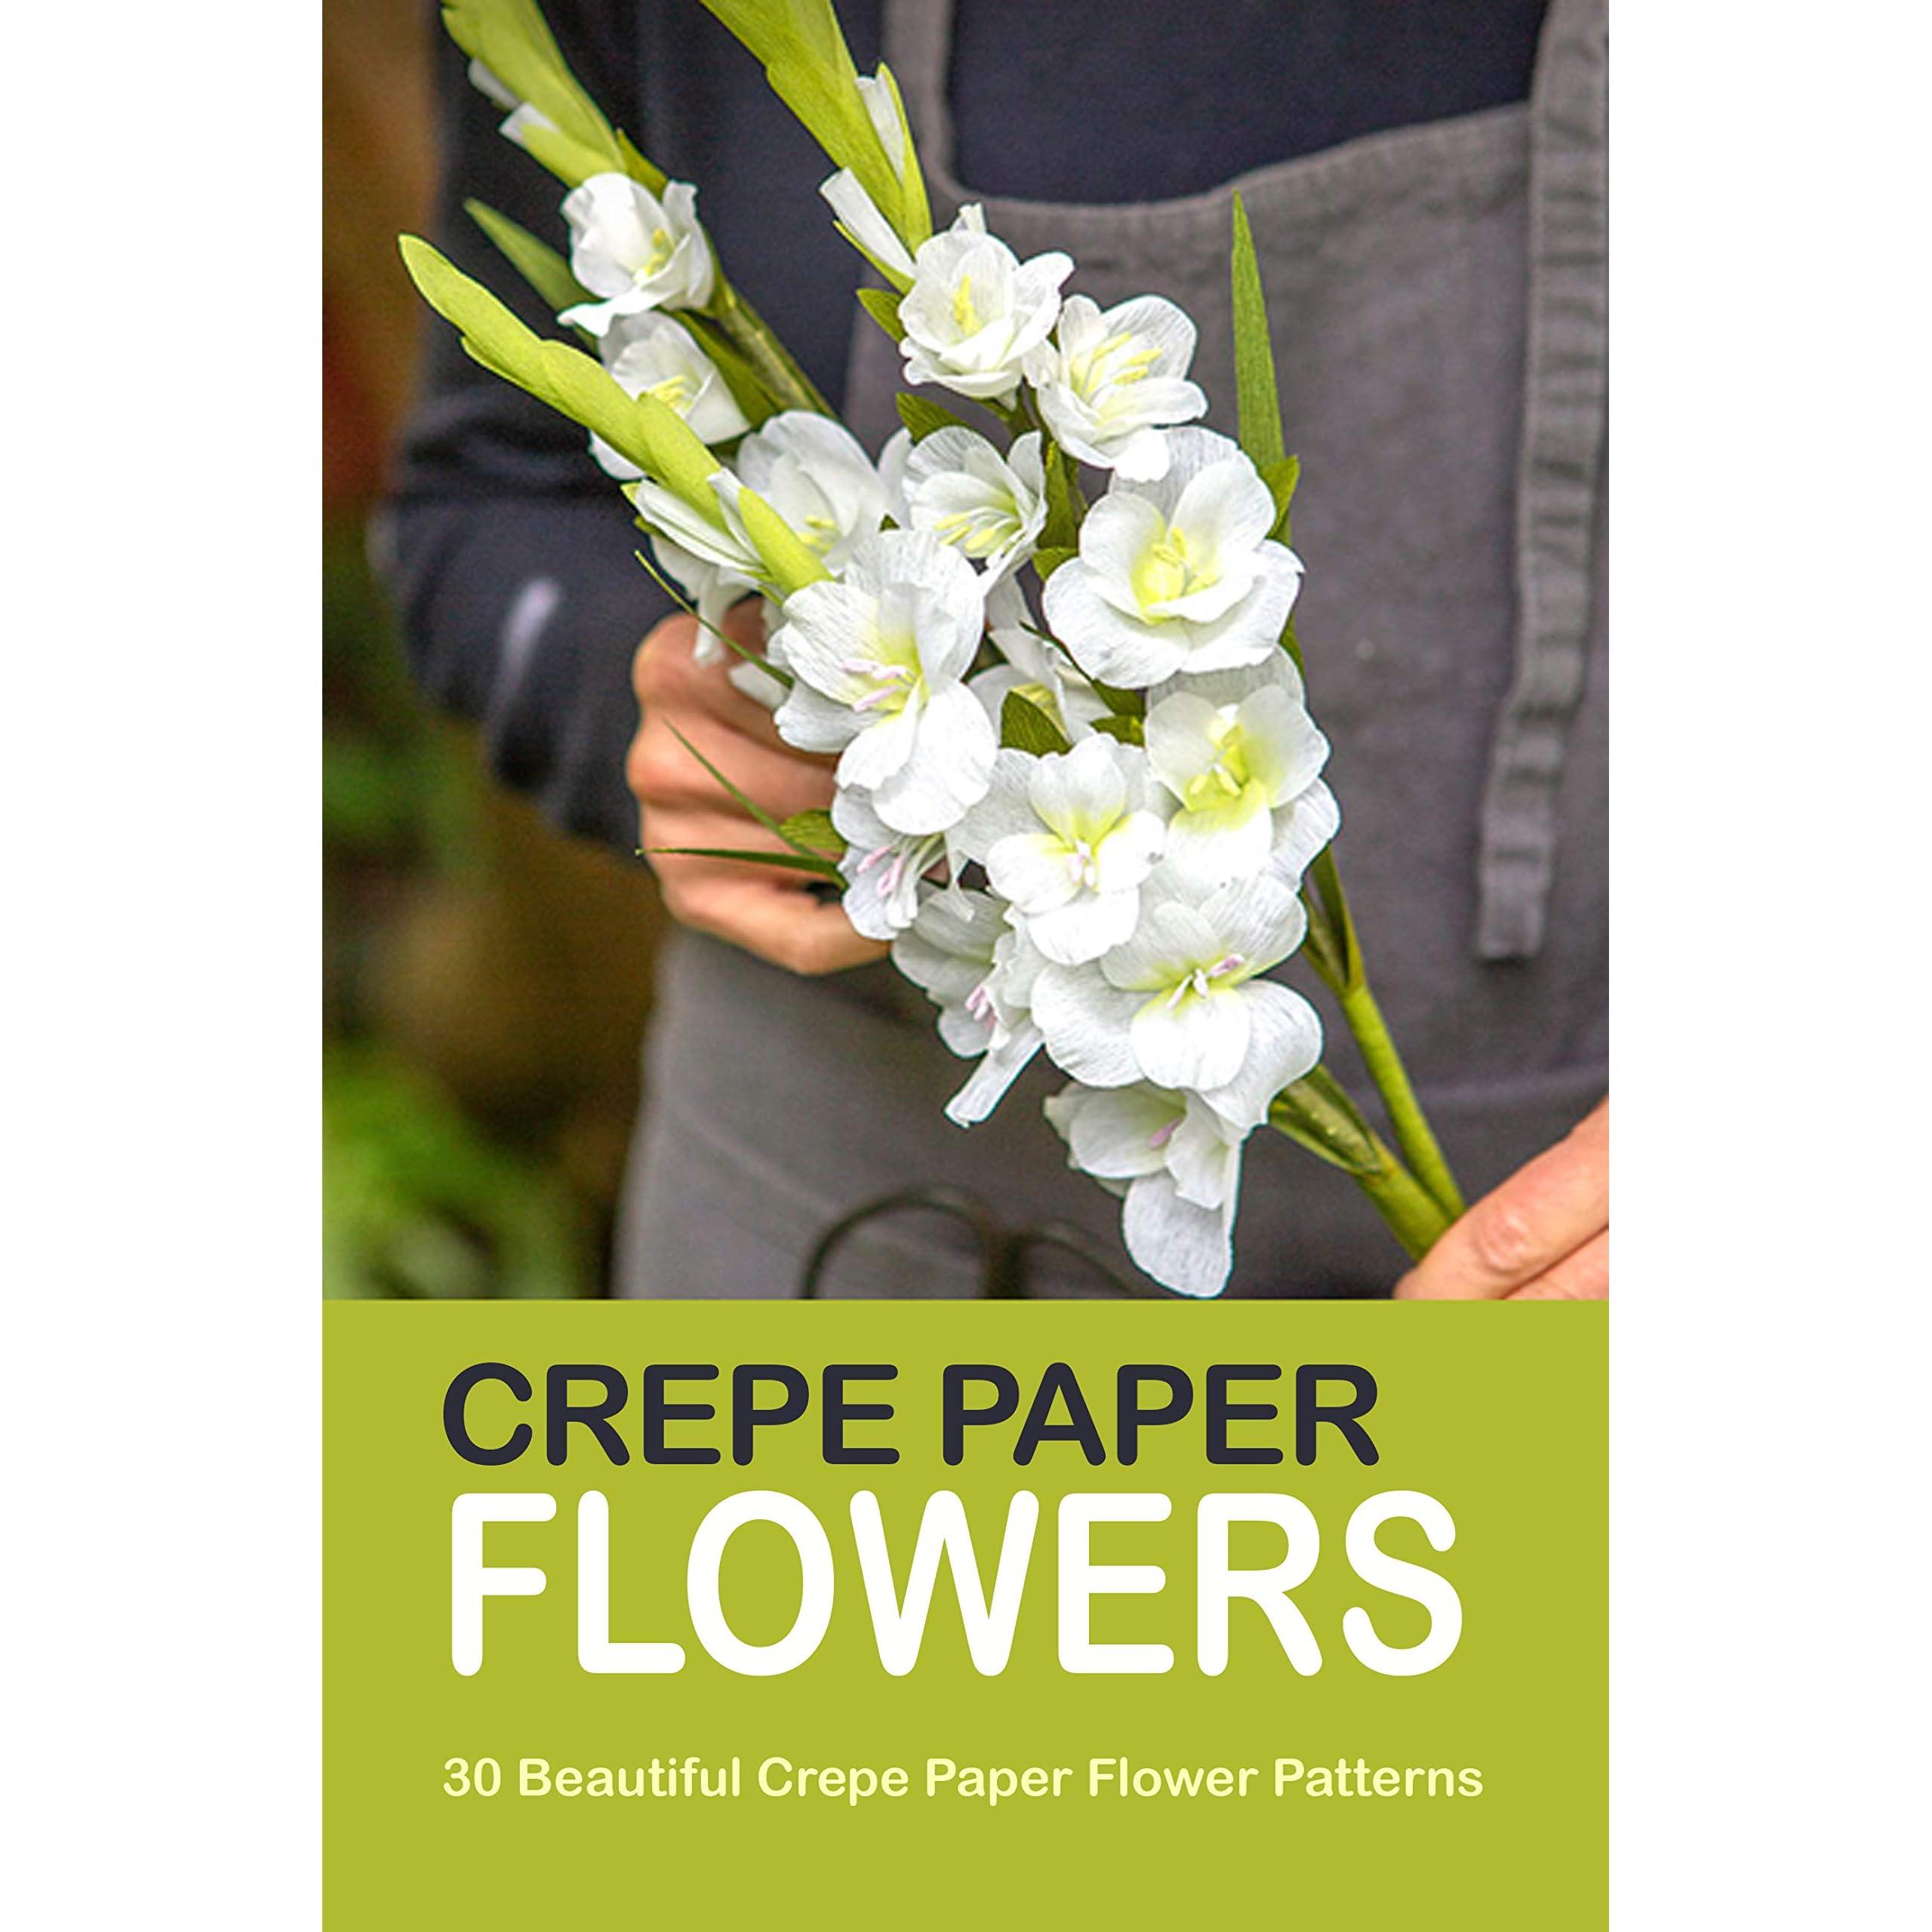 Crepe Paper Flowers 30 Beautiful Crepe Paper Flower Patterns By Mike Kozarski